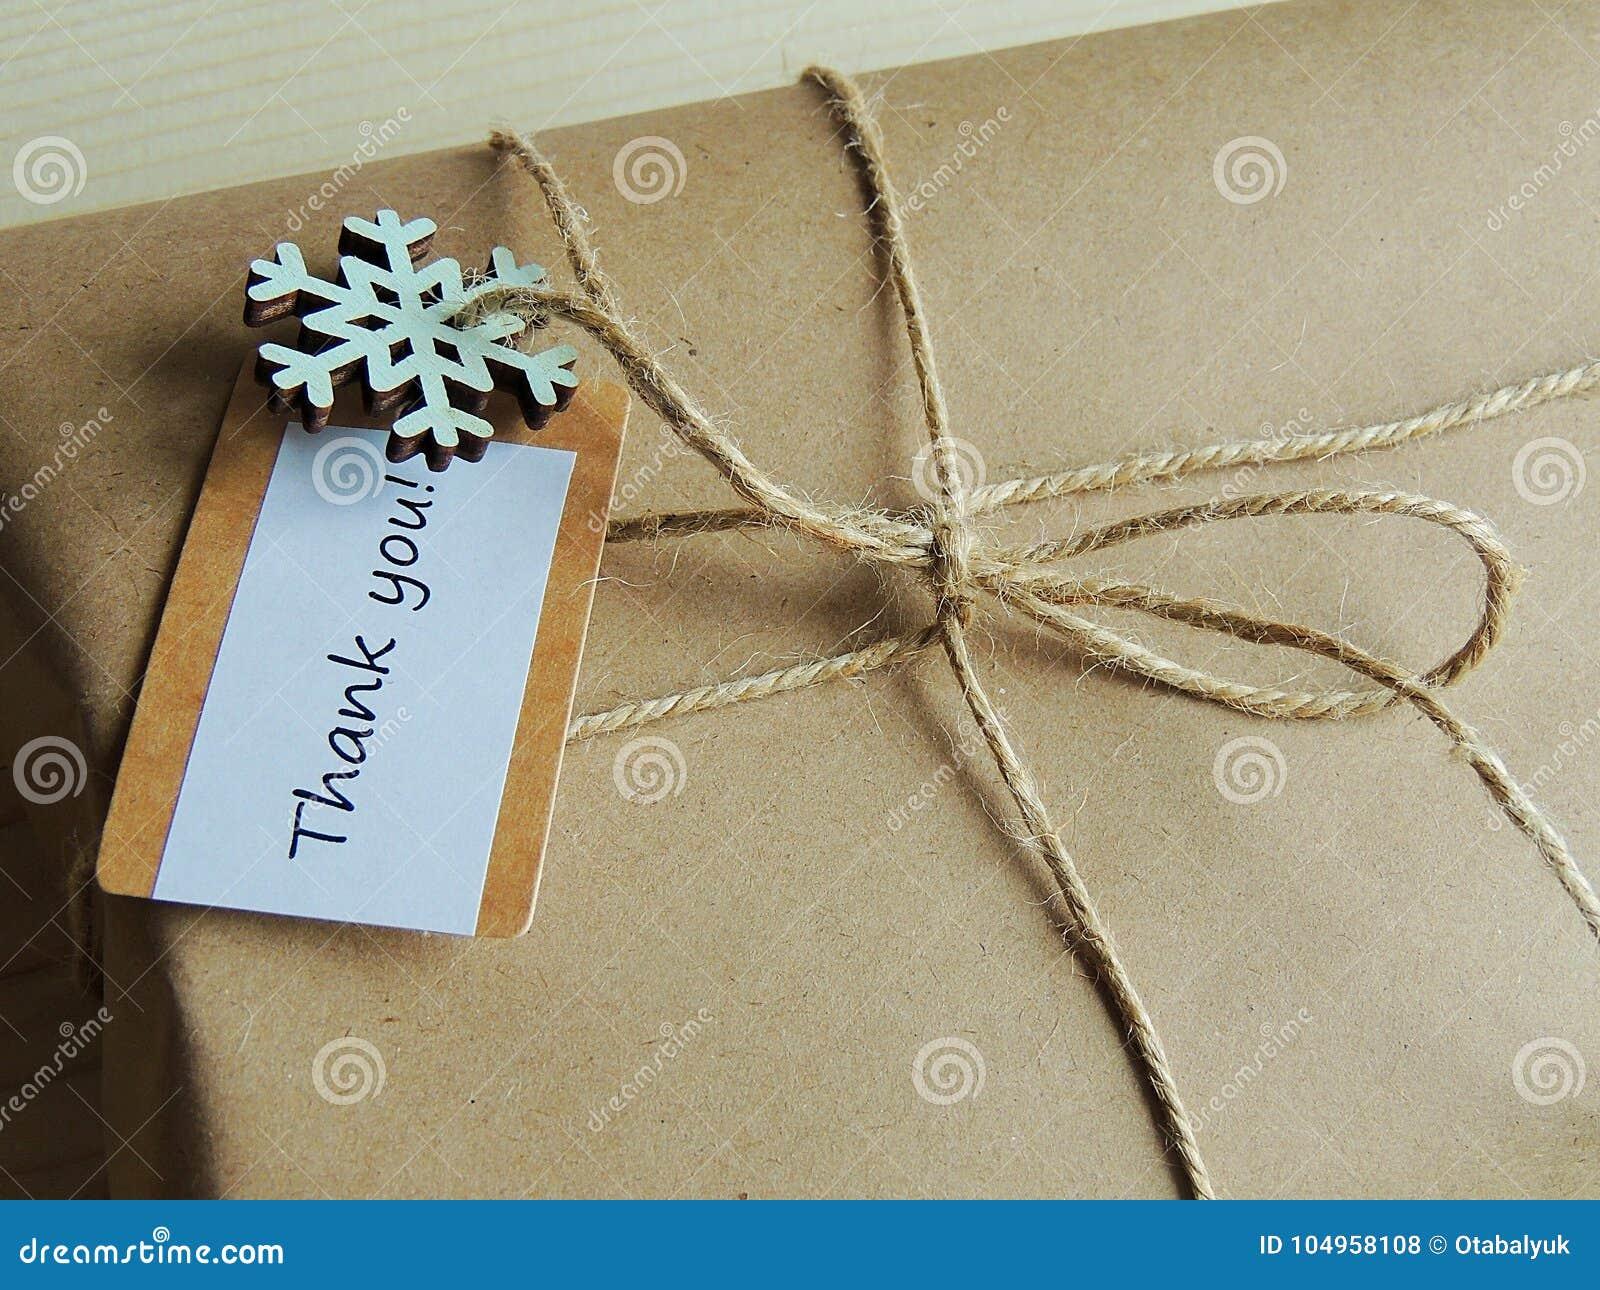 Small company christmas gift ideas